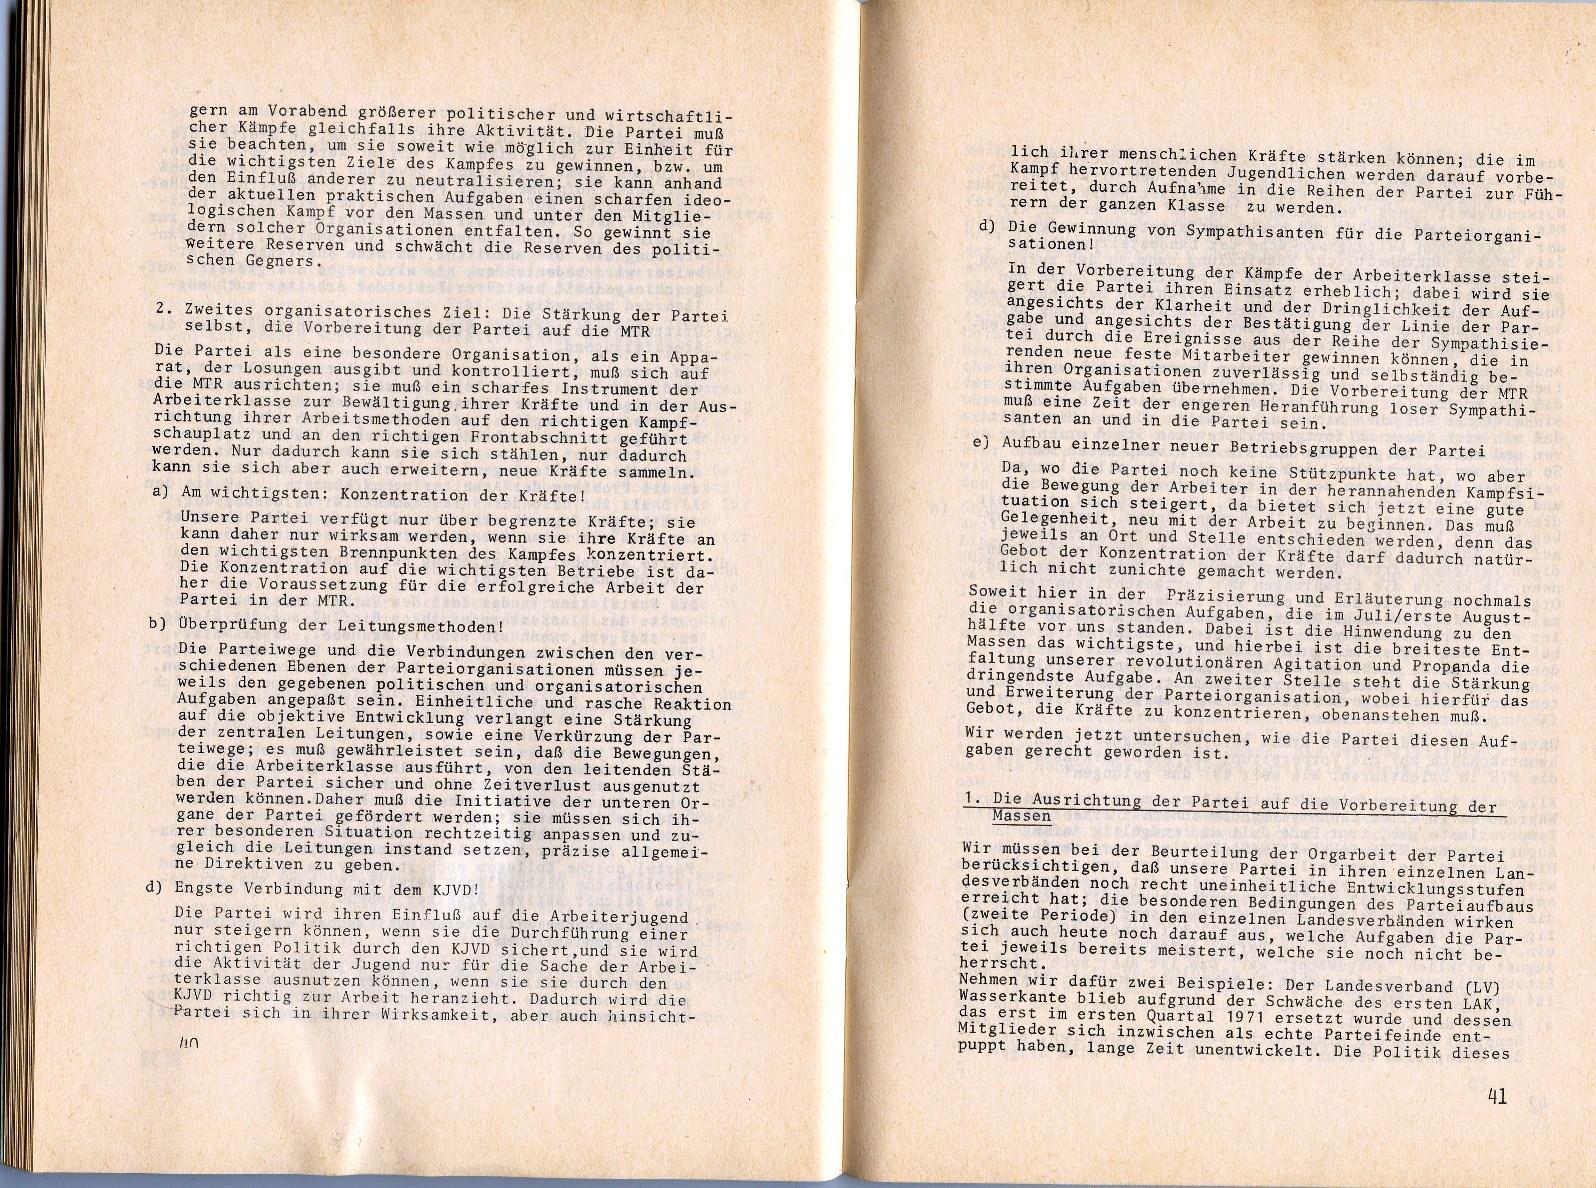 ZB_Parteiarbeiter_1971_07_22